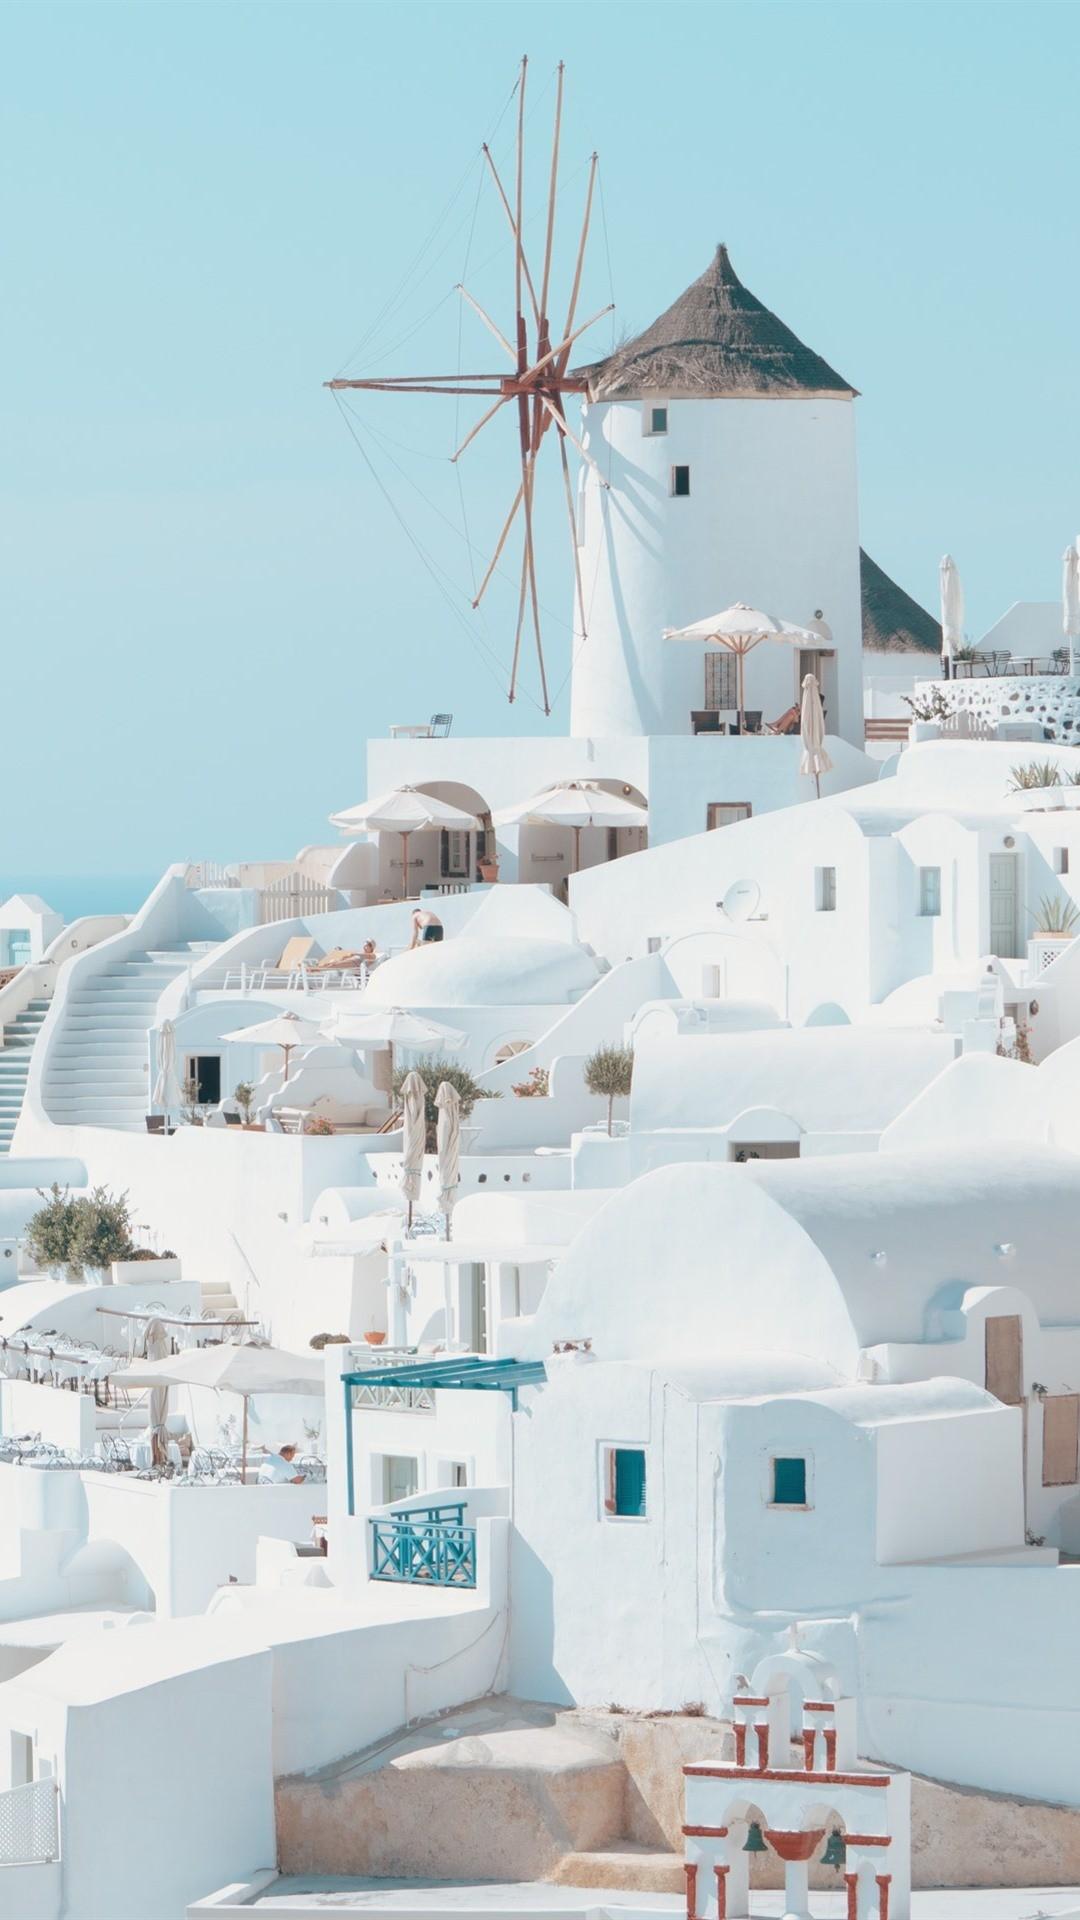 73 Santorini Wallpapers on WallpaperPlay 1080x1920